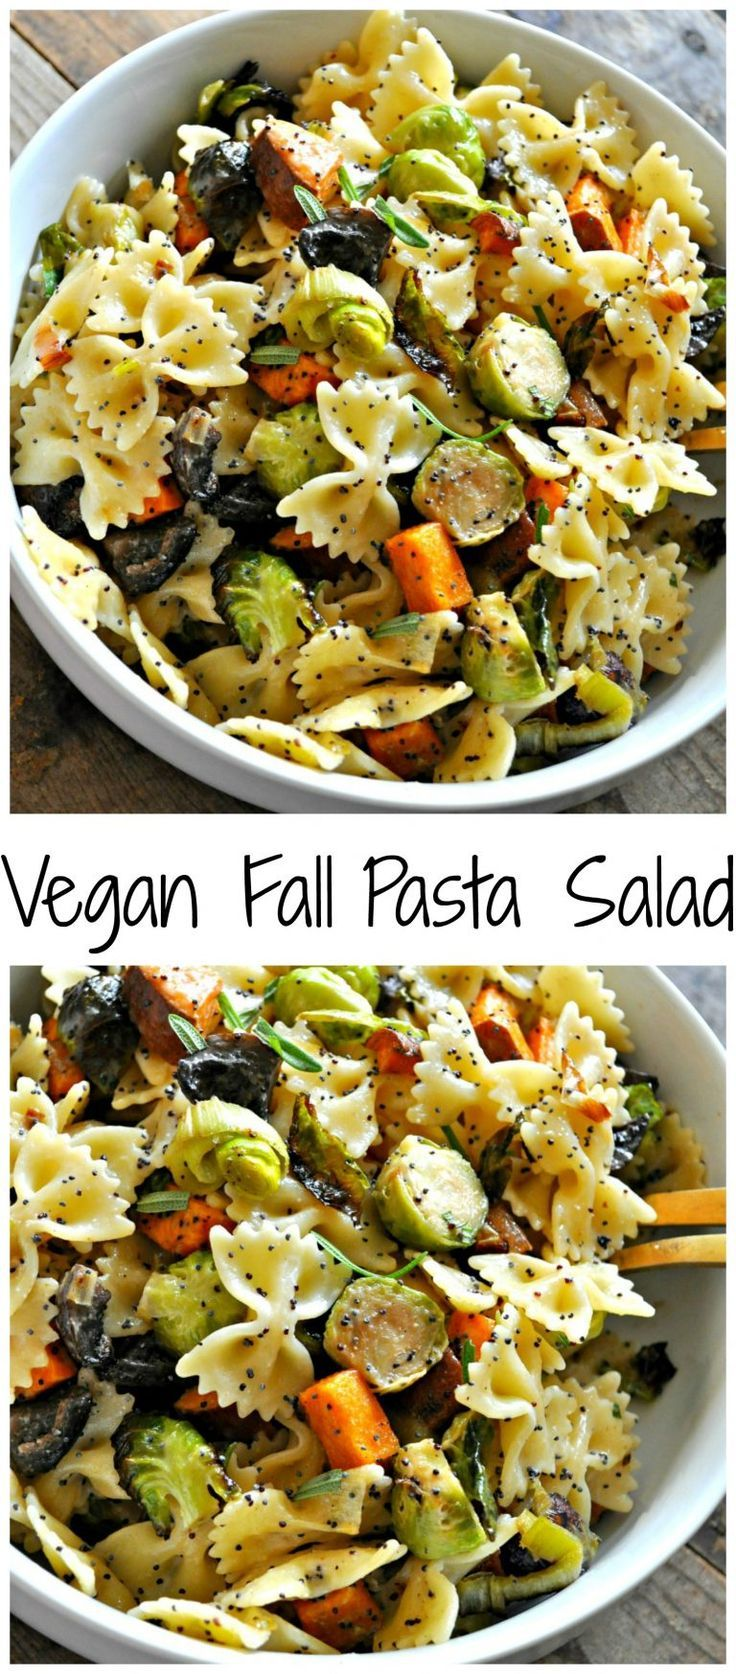 Vegan Fall Pasta Salad